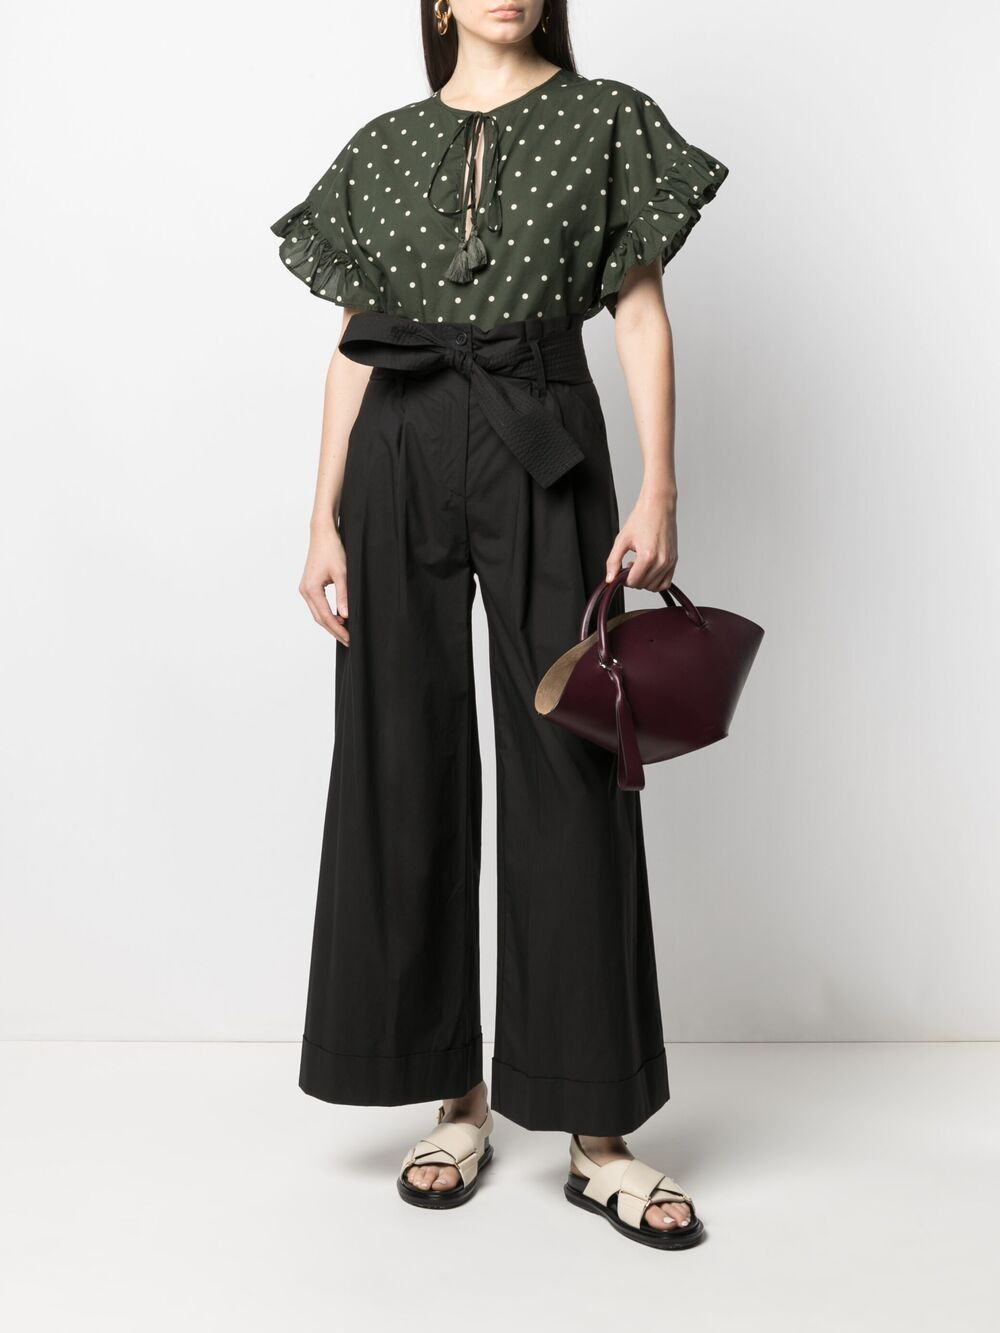 Blusa Clois in cotone verde con stampa a pois P.A.R.O.S.H. | Camicie | D312244-CLOIS807